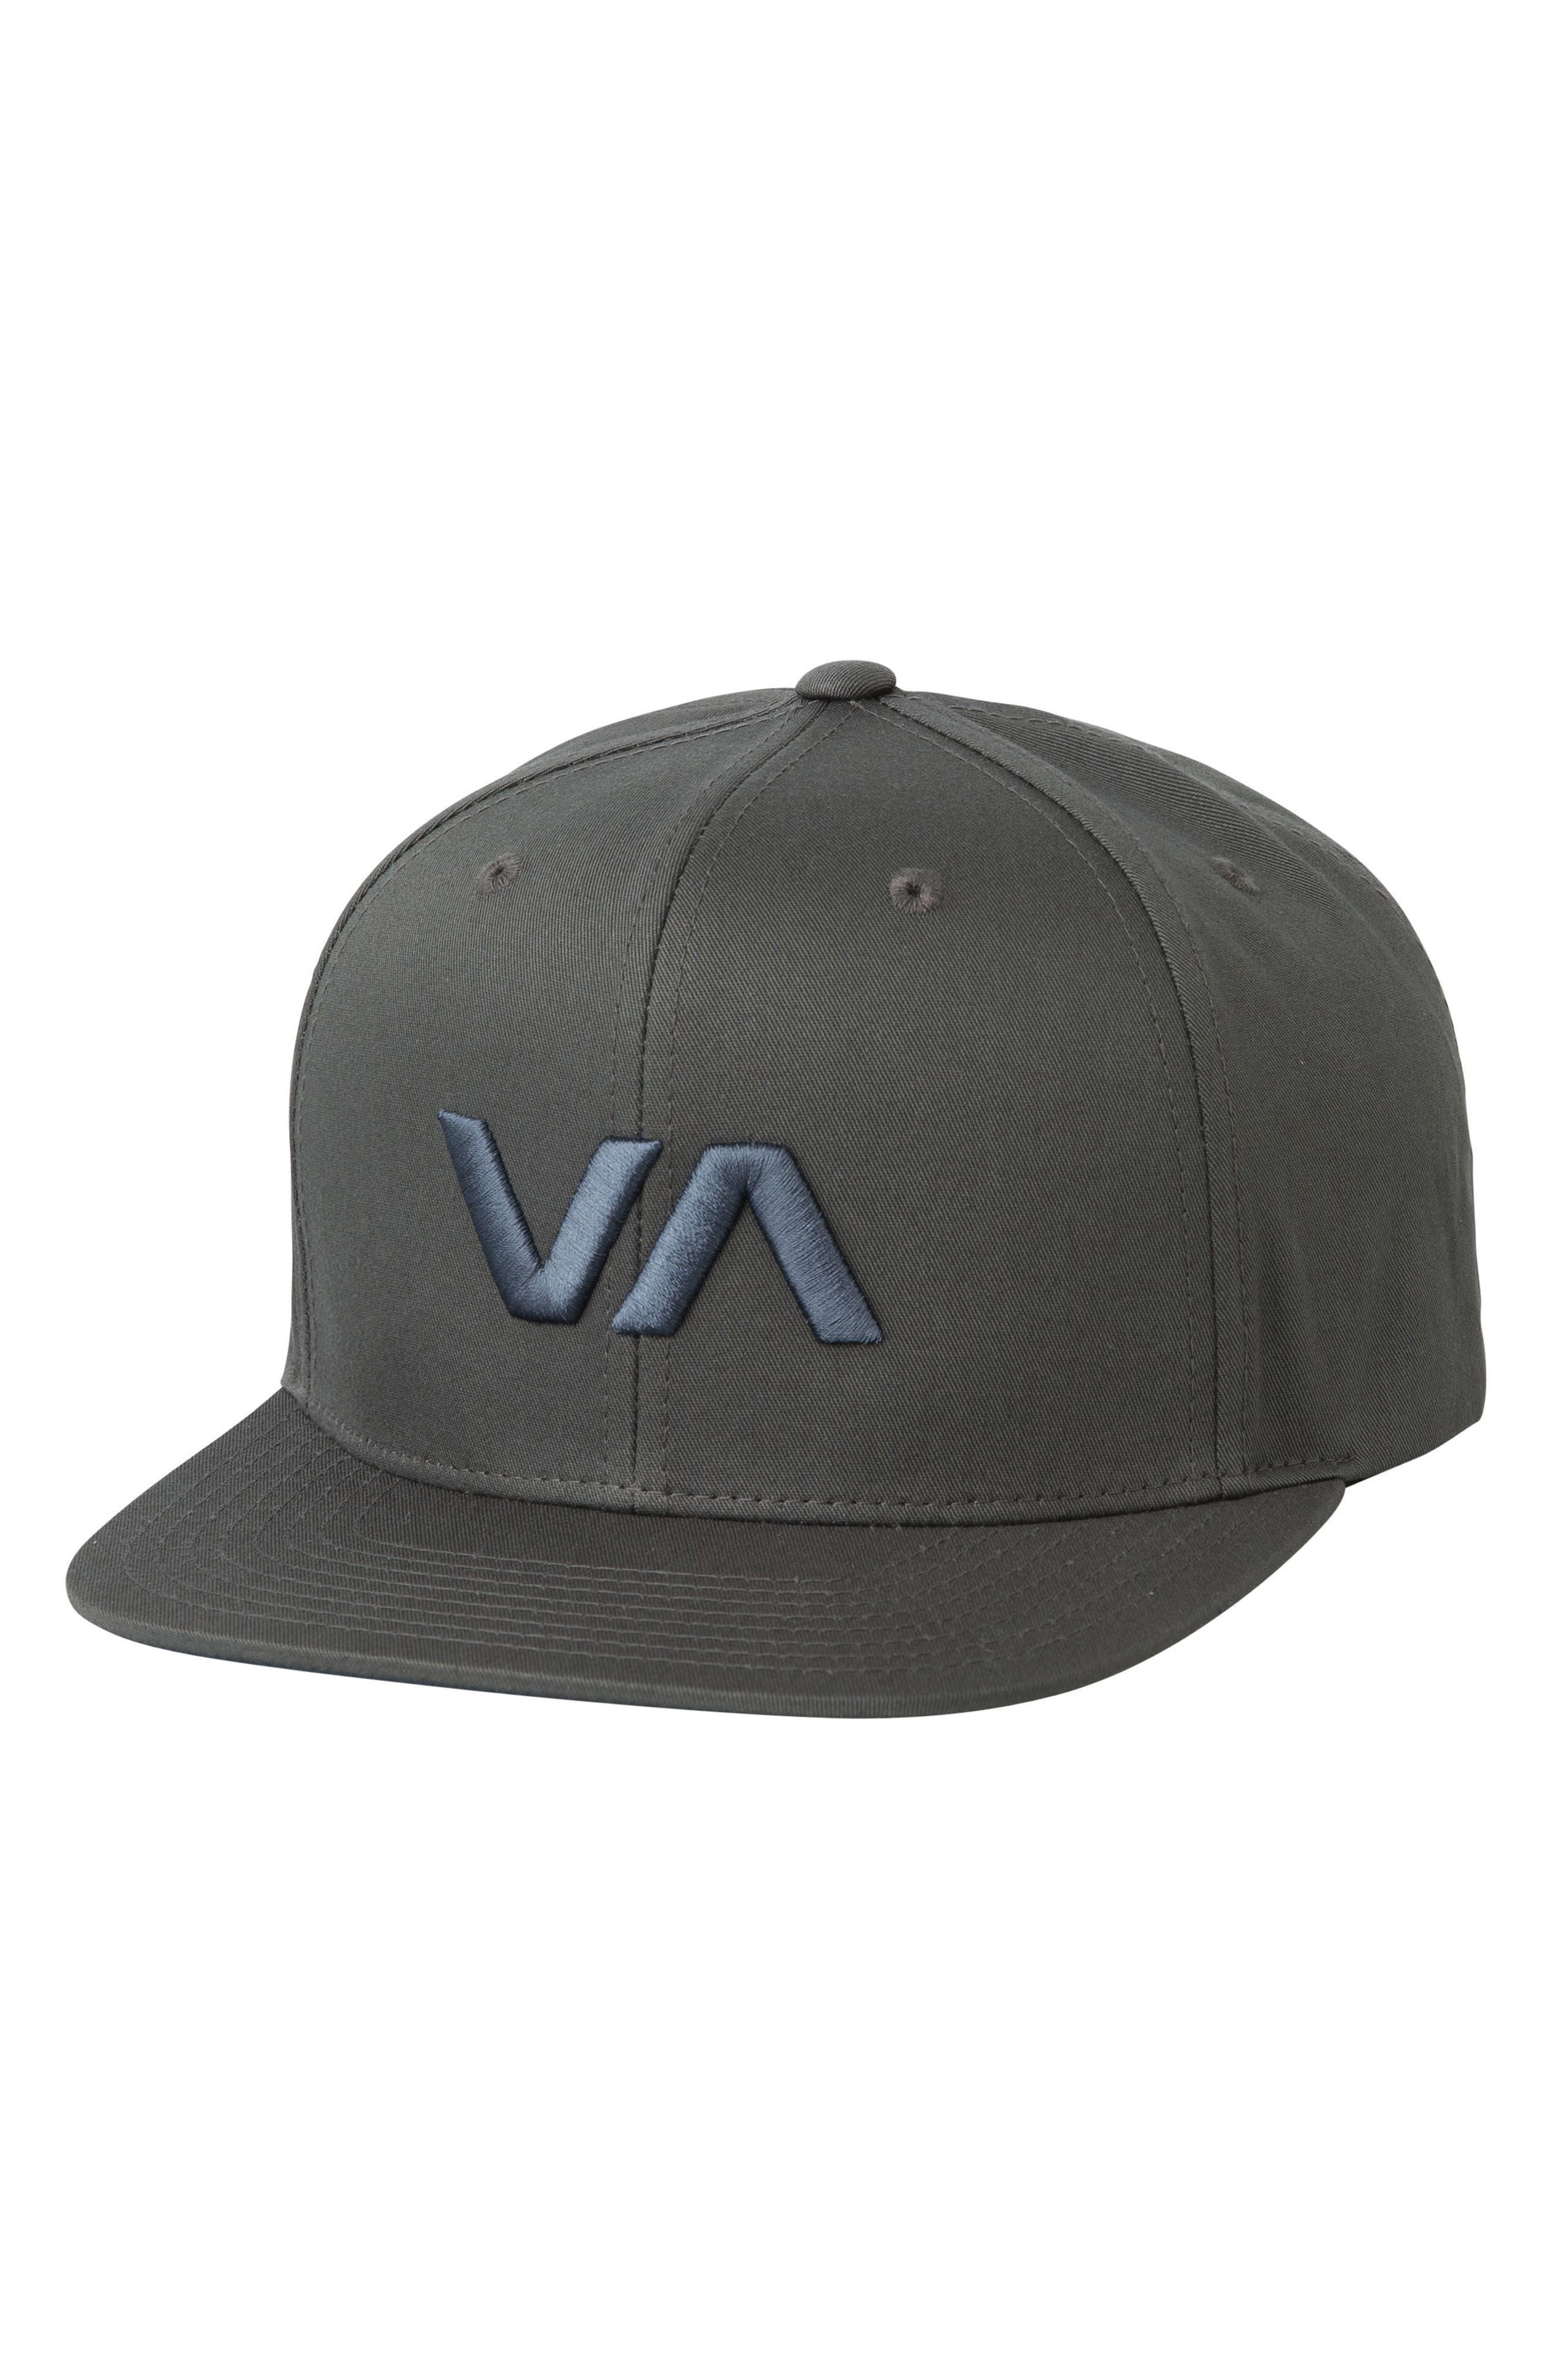 'VA' Snapback Hat,                             Main thumbnail 1, color,                             Grey Blue